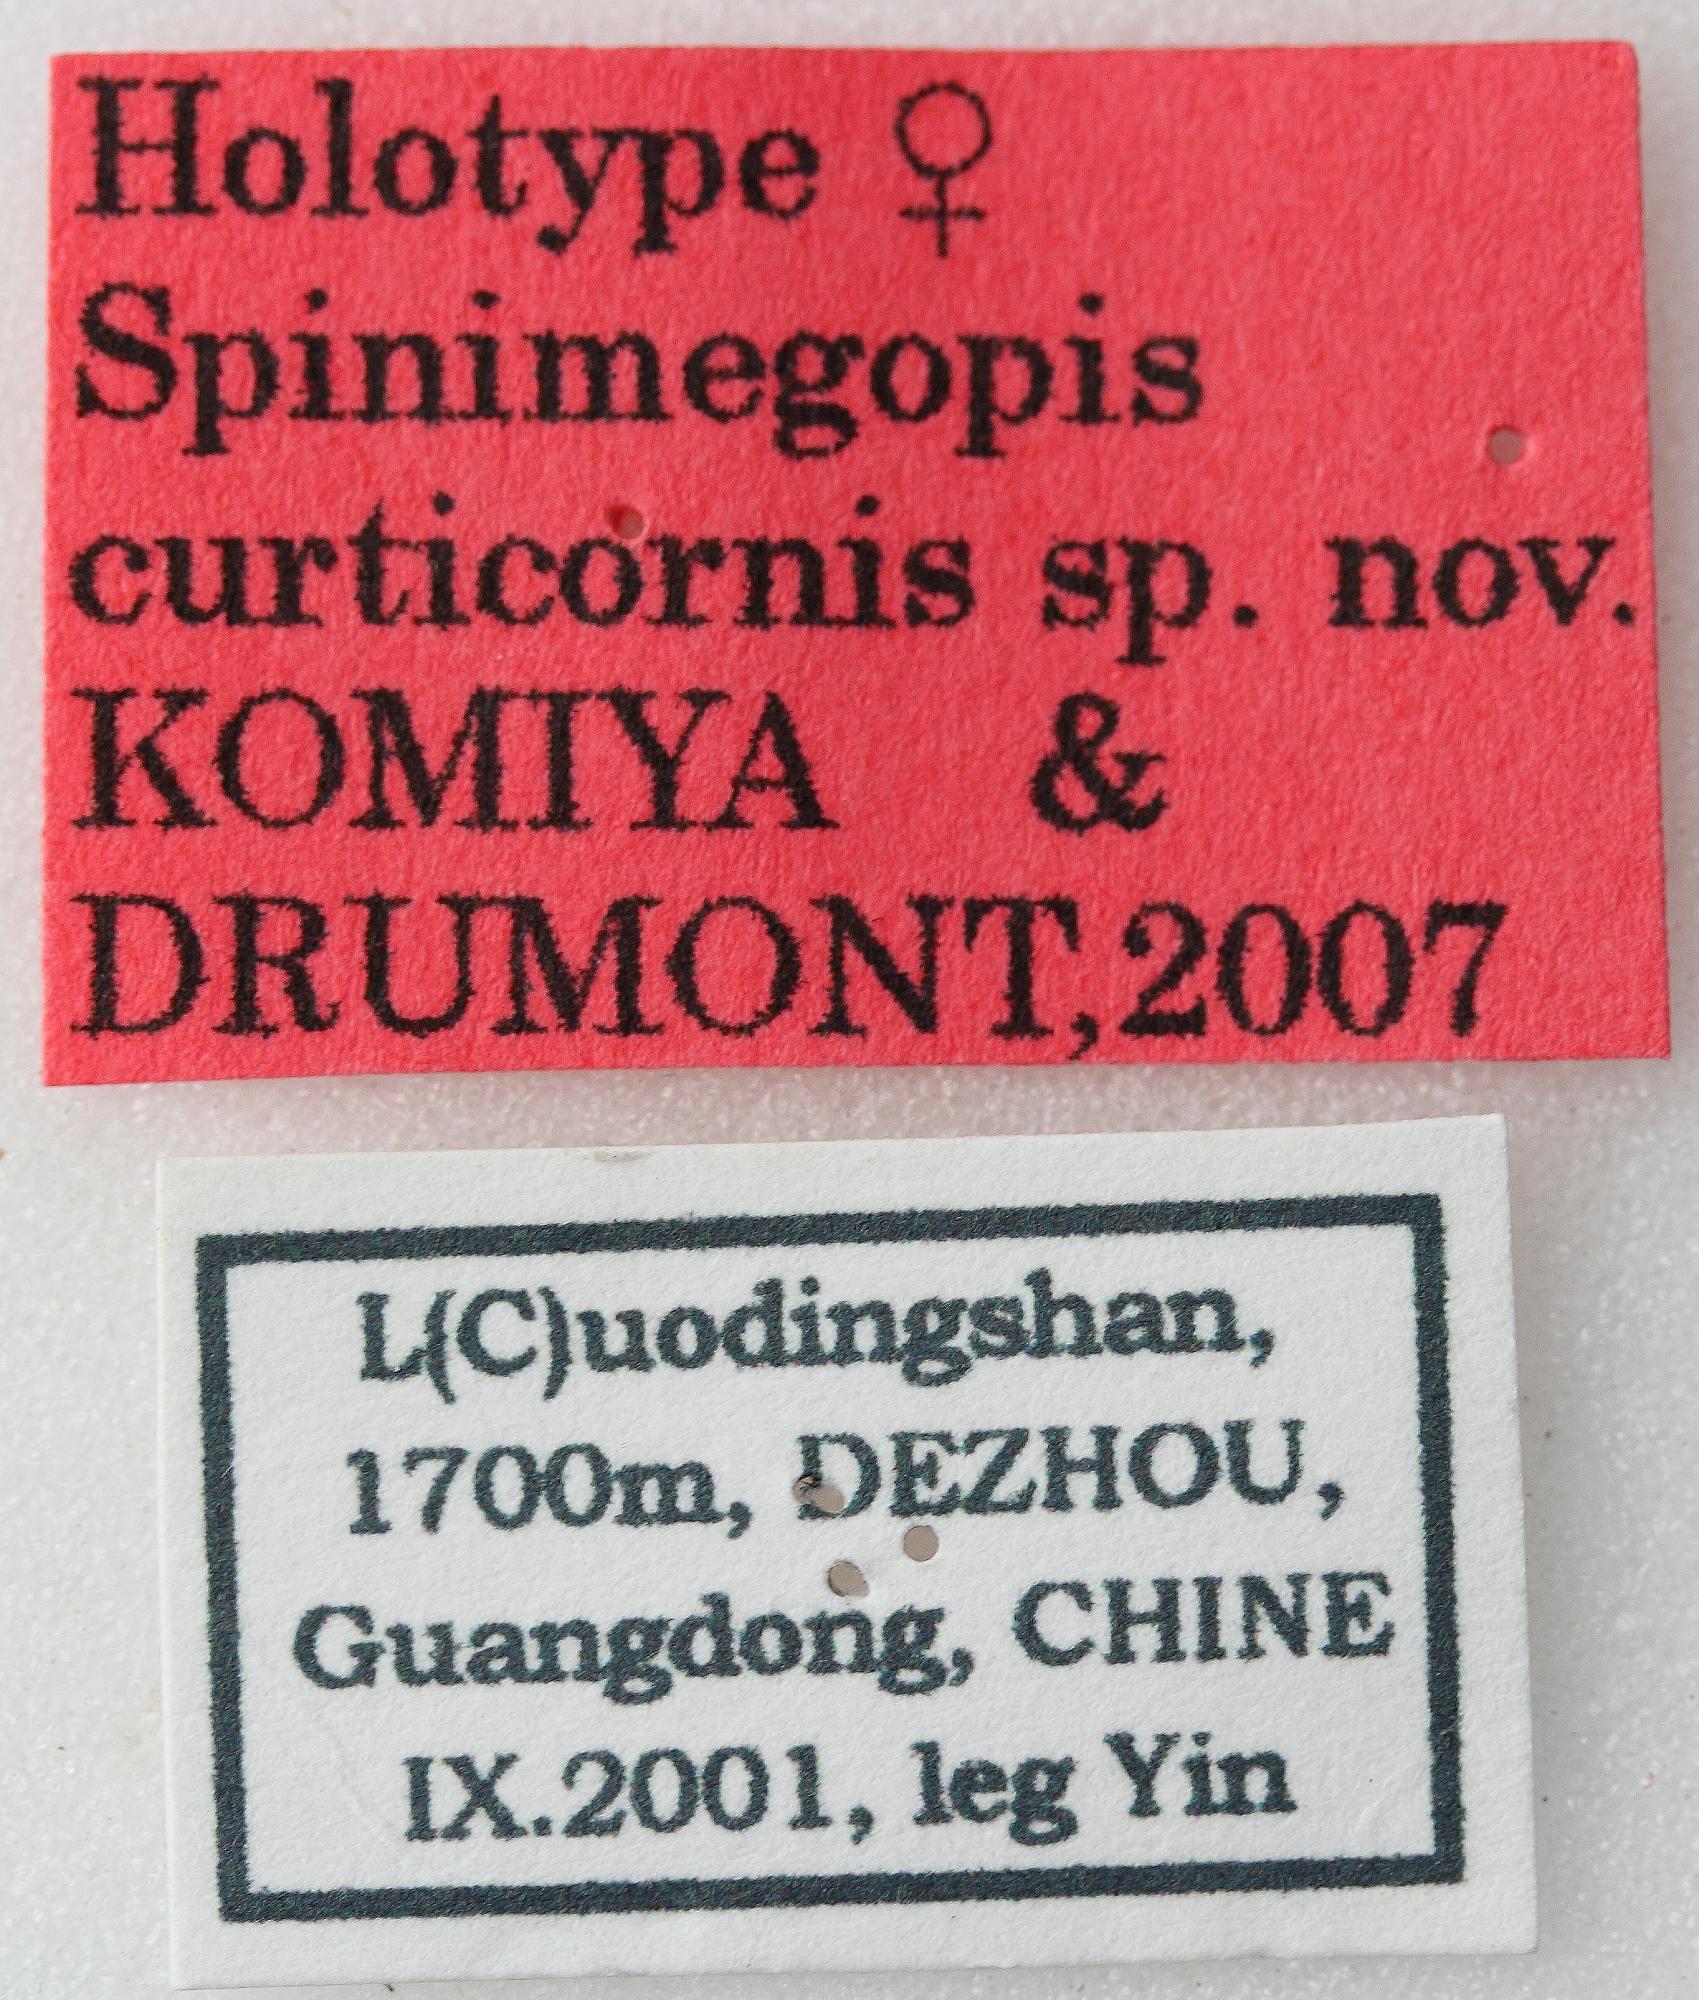 Spinimegopis curticornis 01 00 Holotype F 032 BRUS 201405.jpg